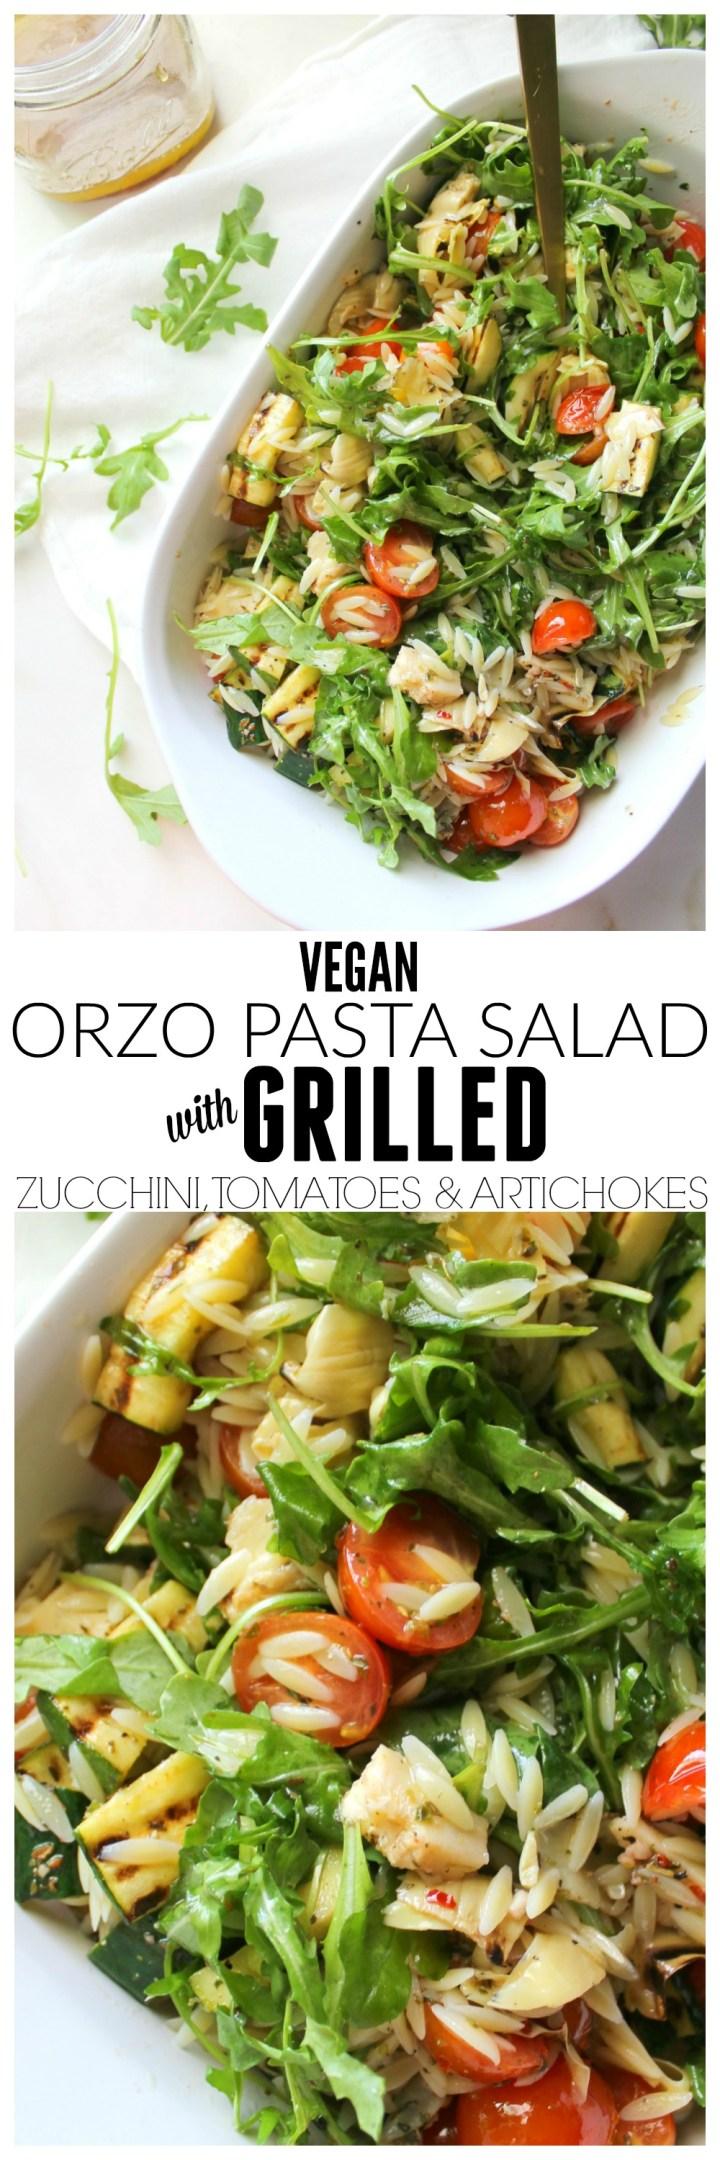 Vegan Orzo Pasta Salad with Grilled Veggies | ThisSavoryVegan.com